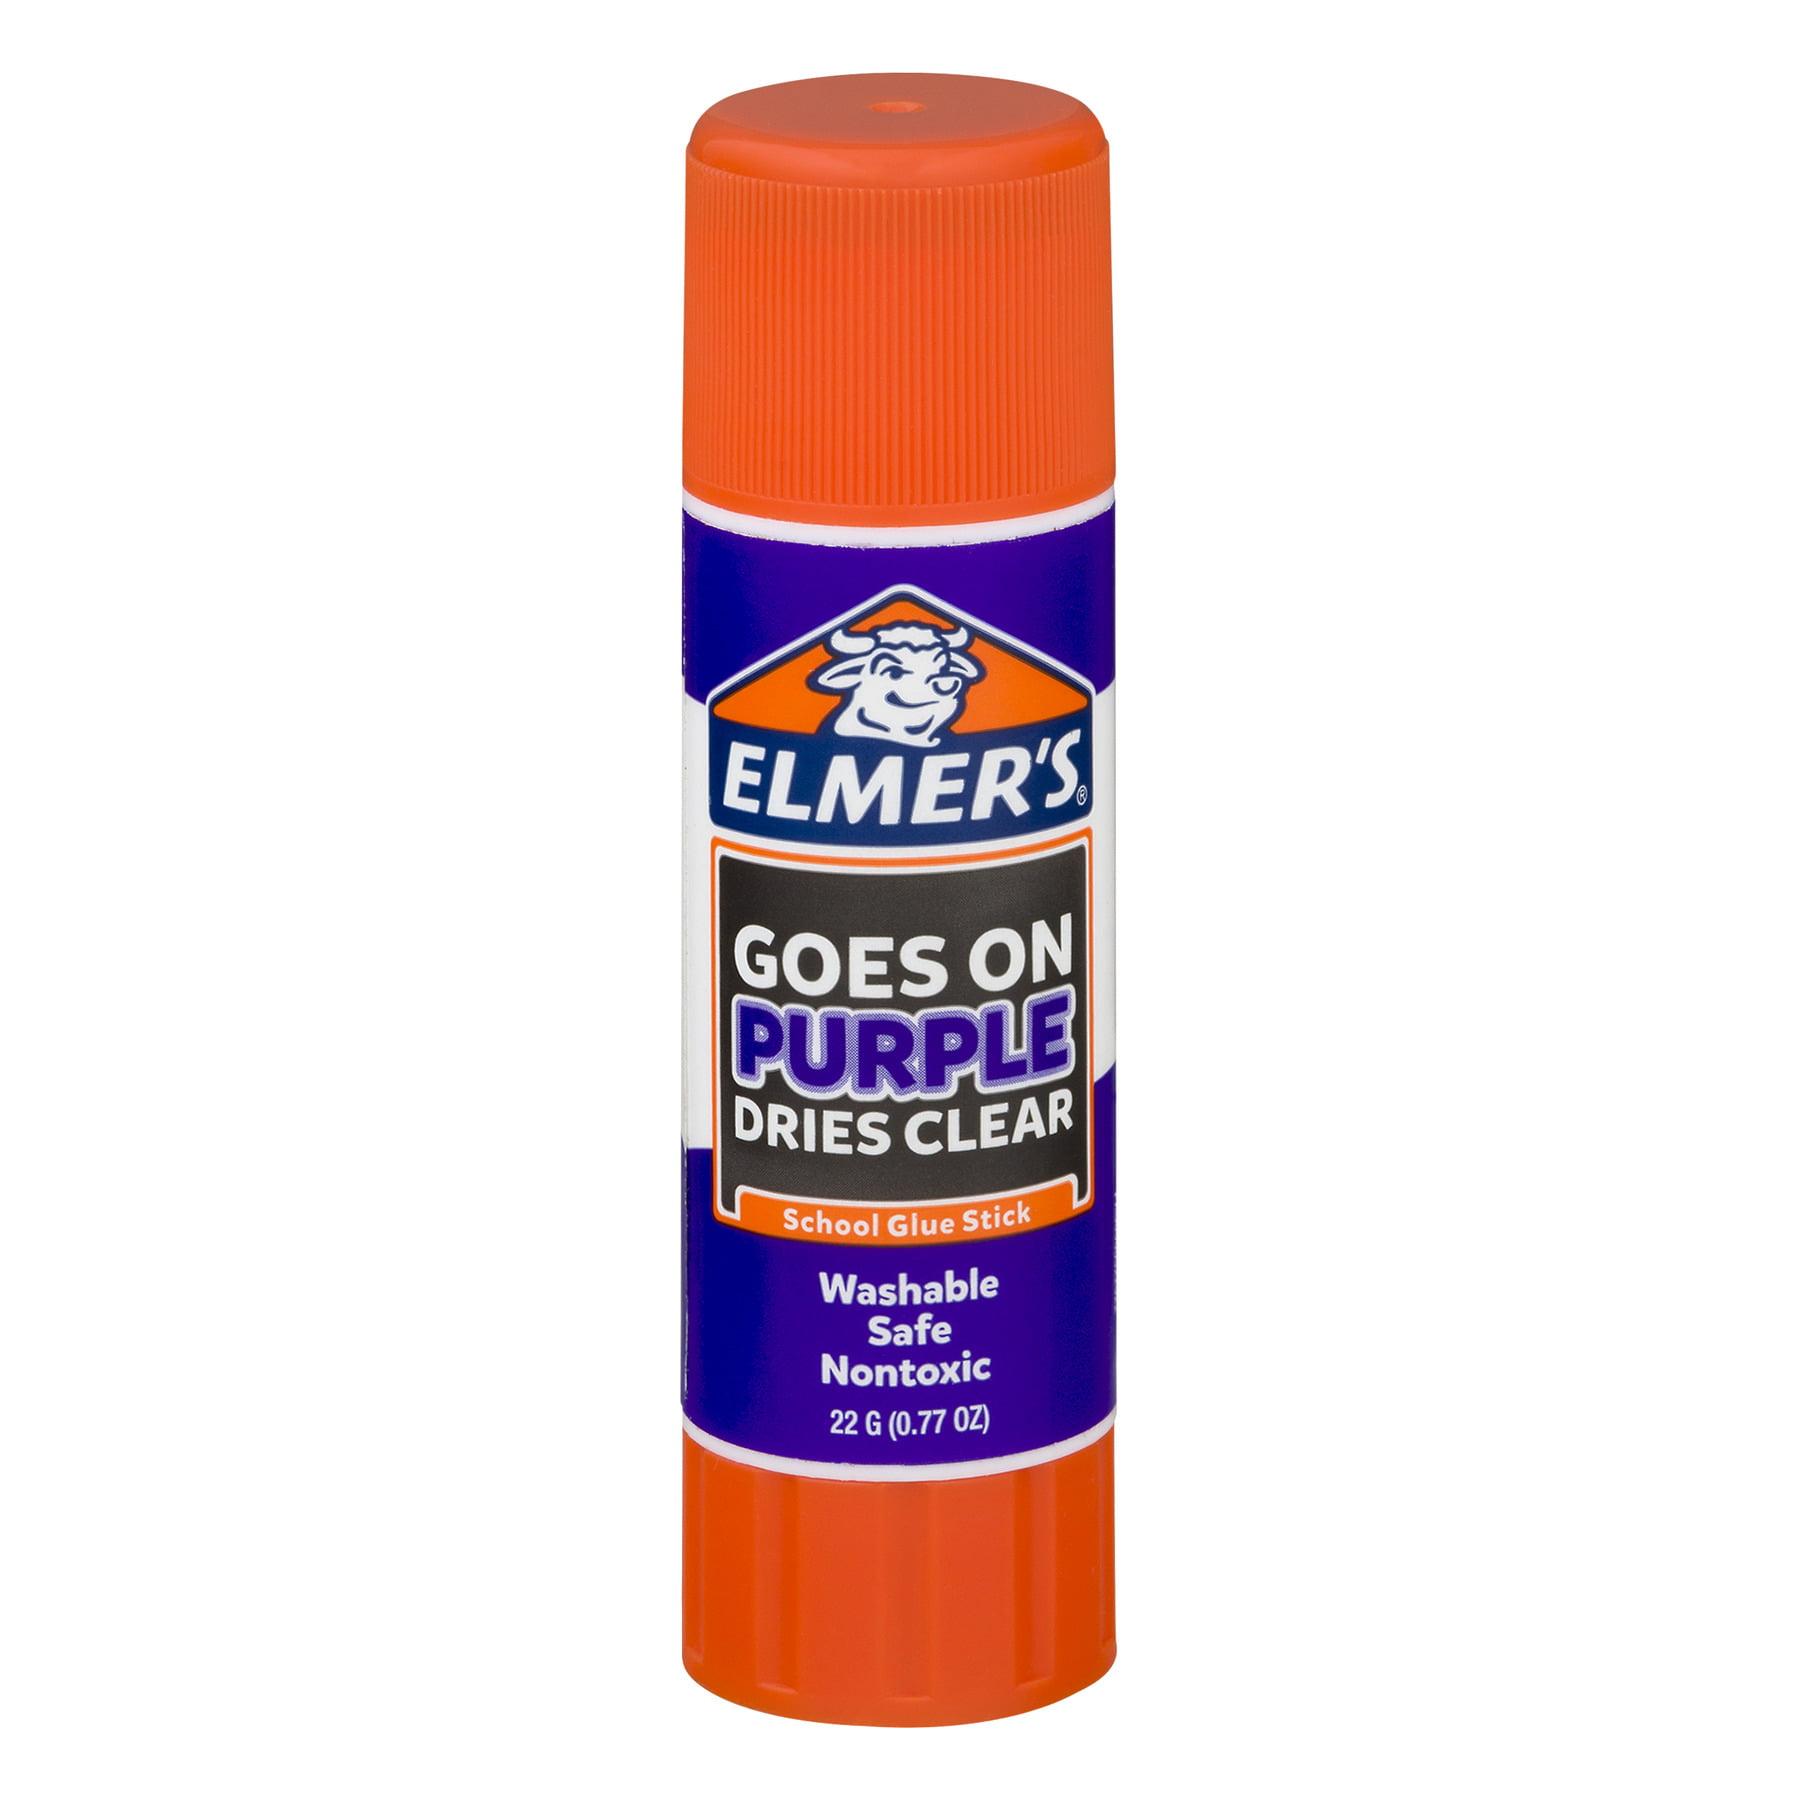 (4 Pack) Elmers Brands 22g School Disappearing Purple Glue Stick